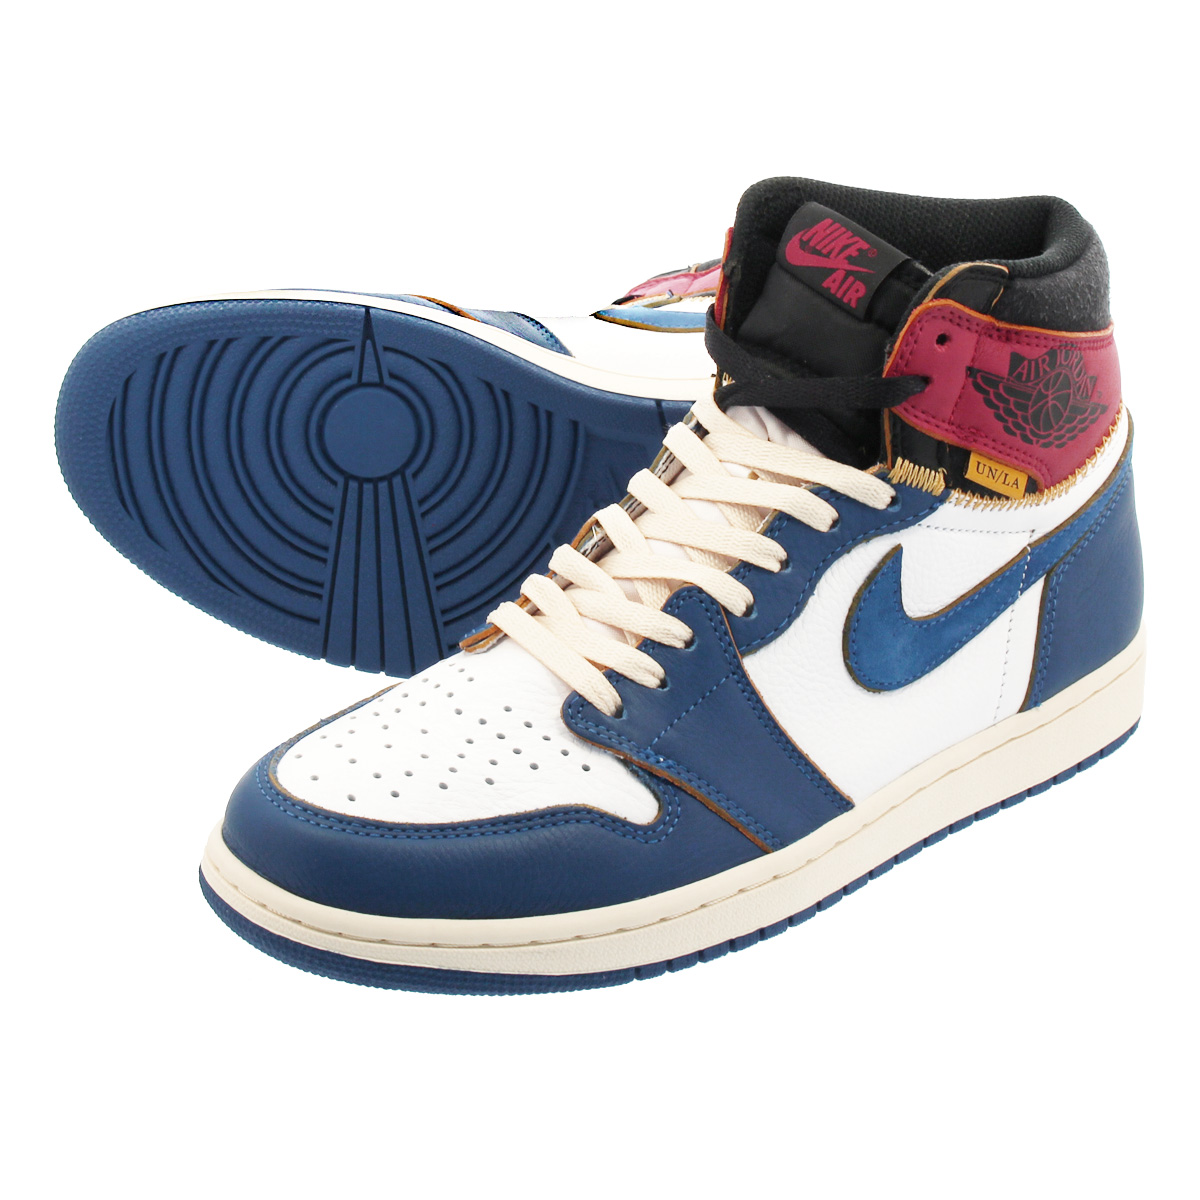 955627eec74b LOWTEX PLUS  NIKE AIR JORDAN 1 RETRO HIGH OG NRG Nike Air Jordan 1  nostalgic high OG NRG union WHITE STORM BLUE VARSITY RED BLACK bv1300-146